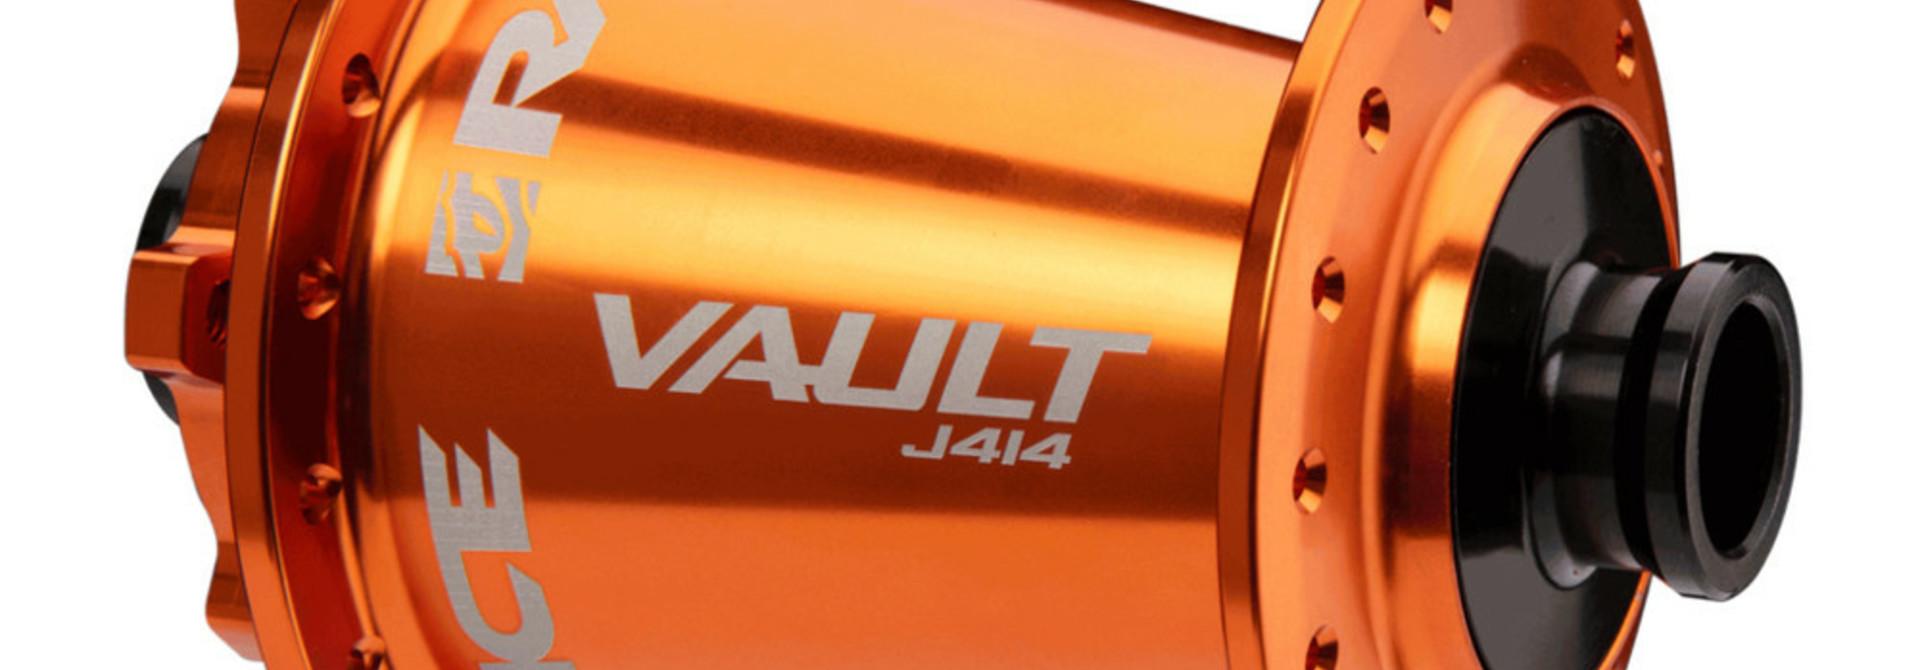 Raceface Vault J-Bend Hubs 32 Hole Front